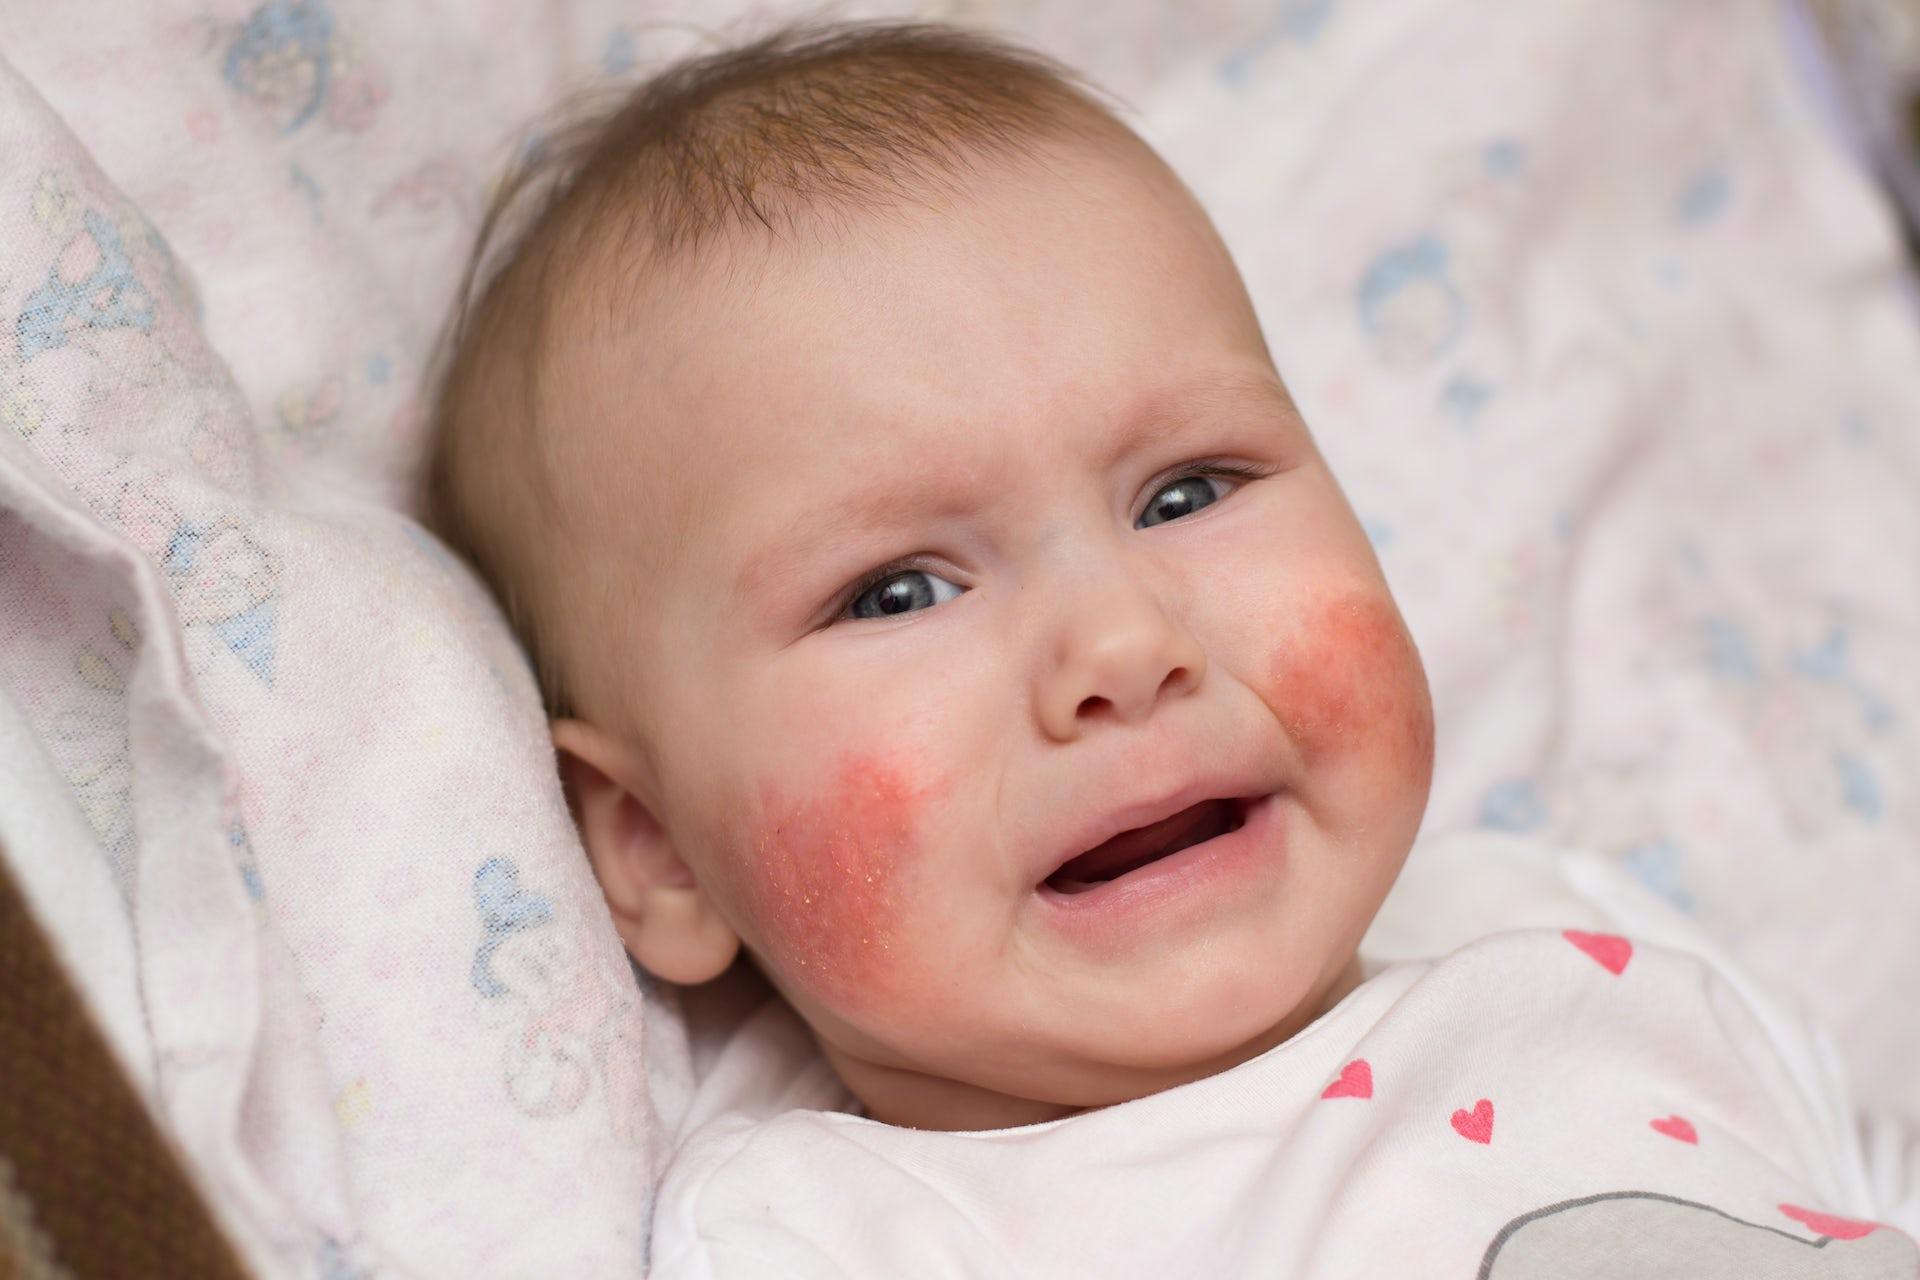 Applying live bacteria to skin improves eczema